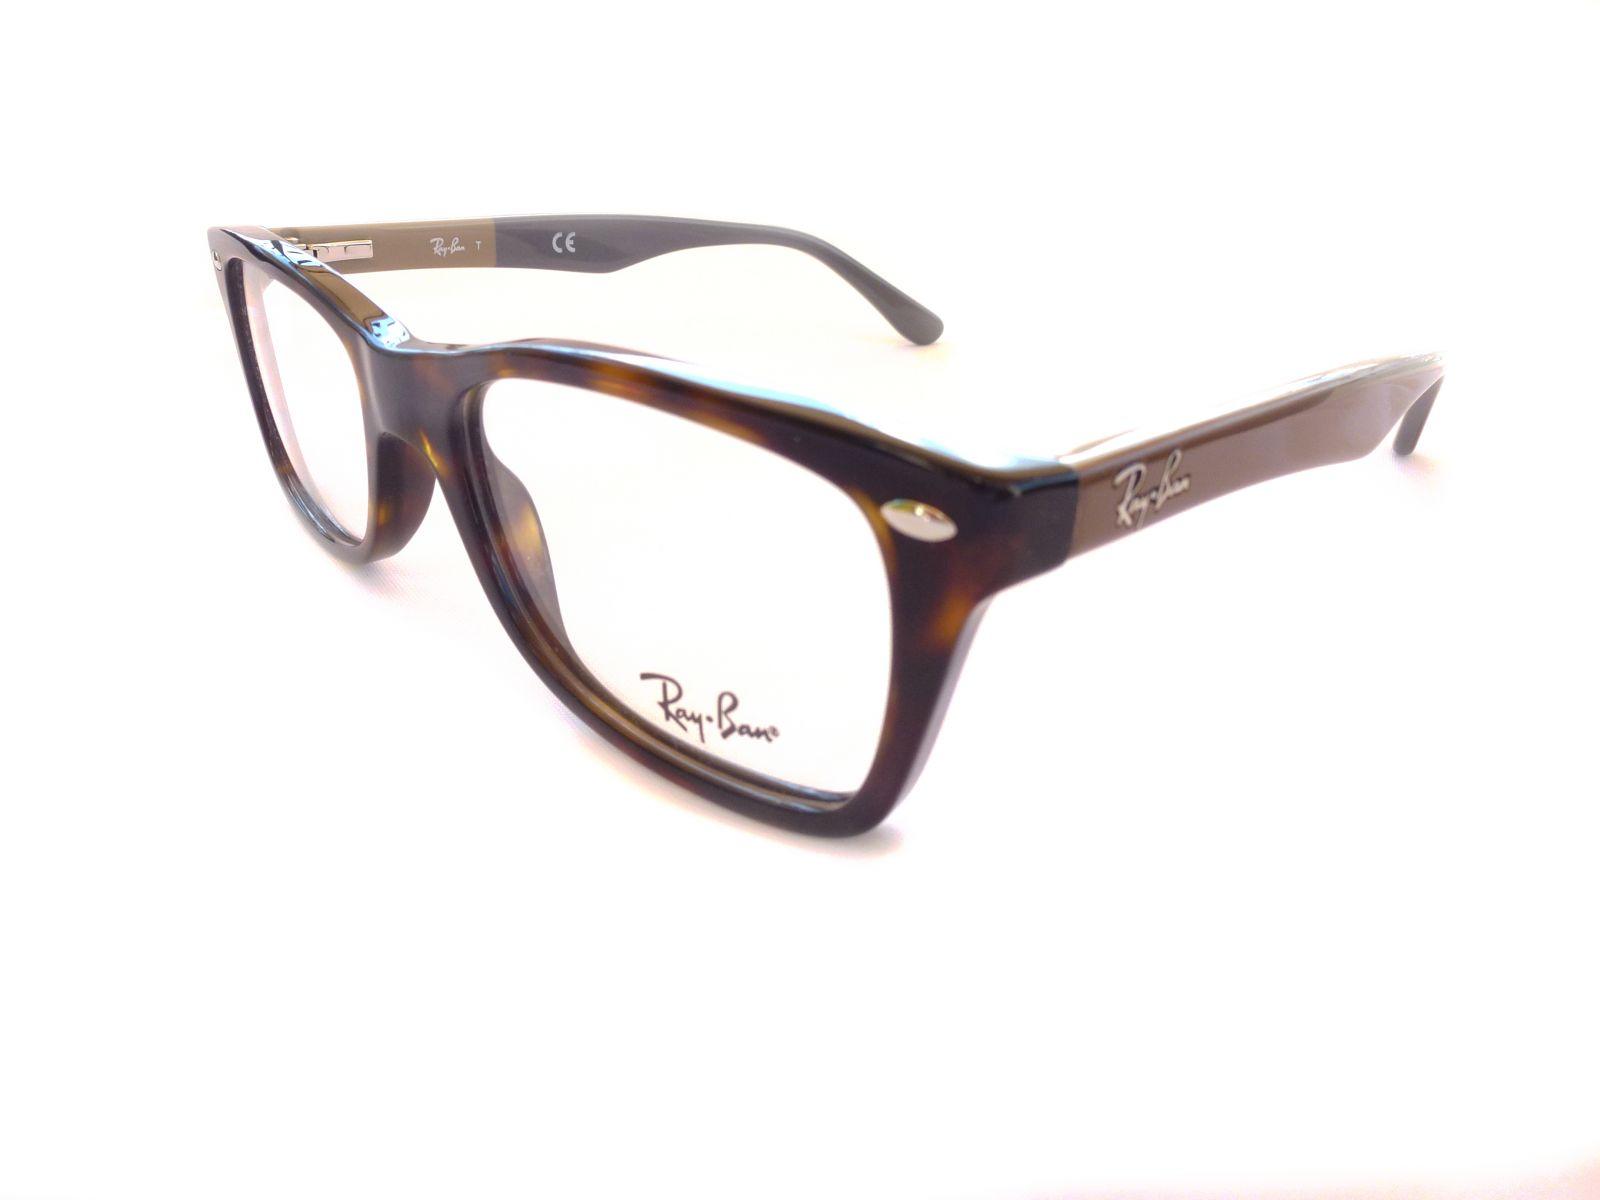 800b049ebd Ray Ban Reading Glasses Rb5228 « Heritage Malta